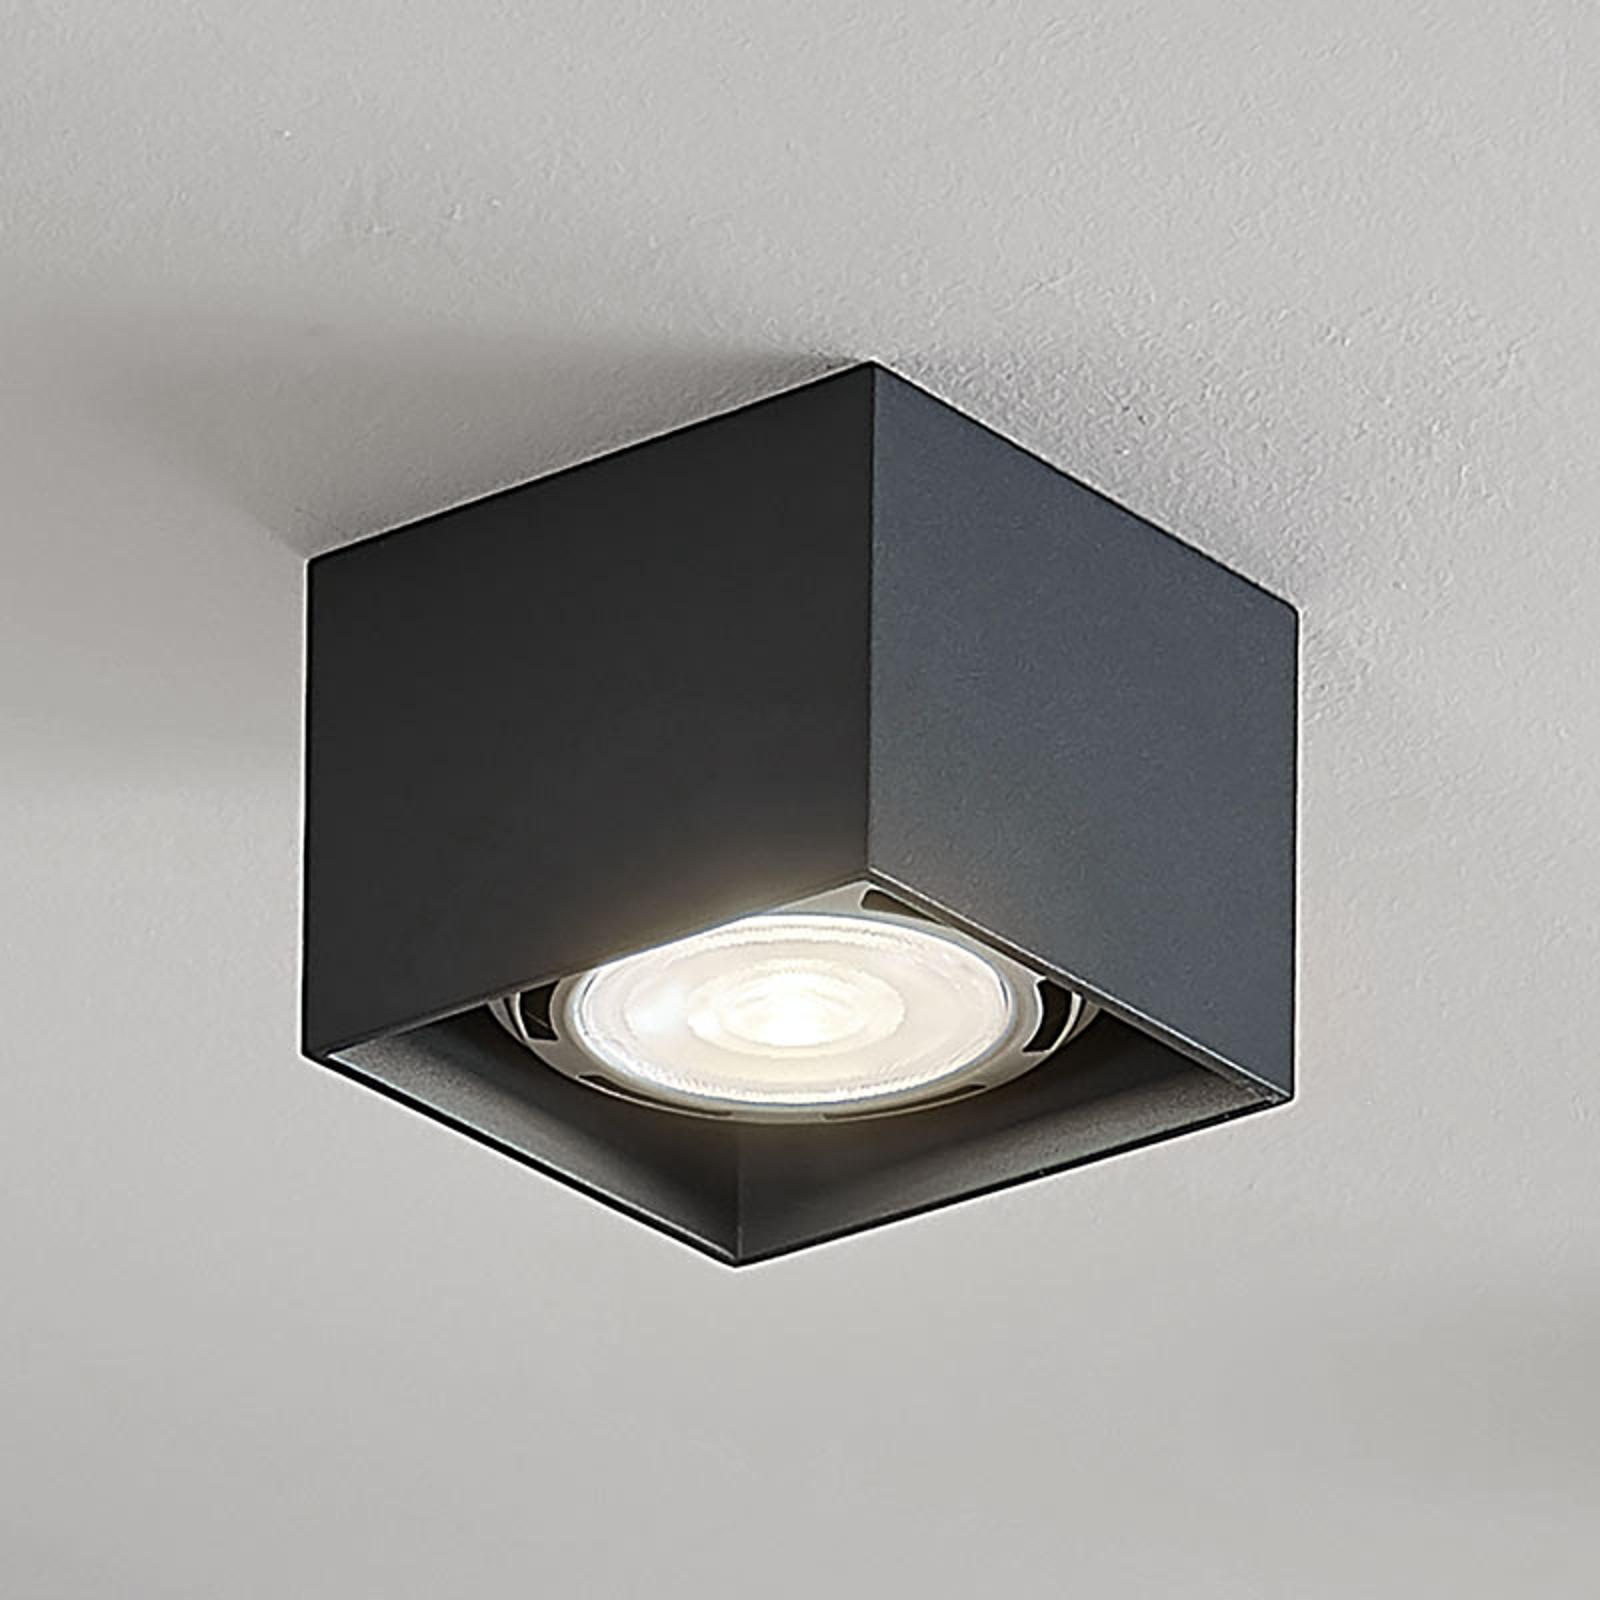 LED-takspot Mabel, kantet, mørk grå